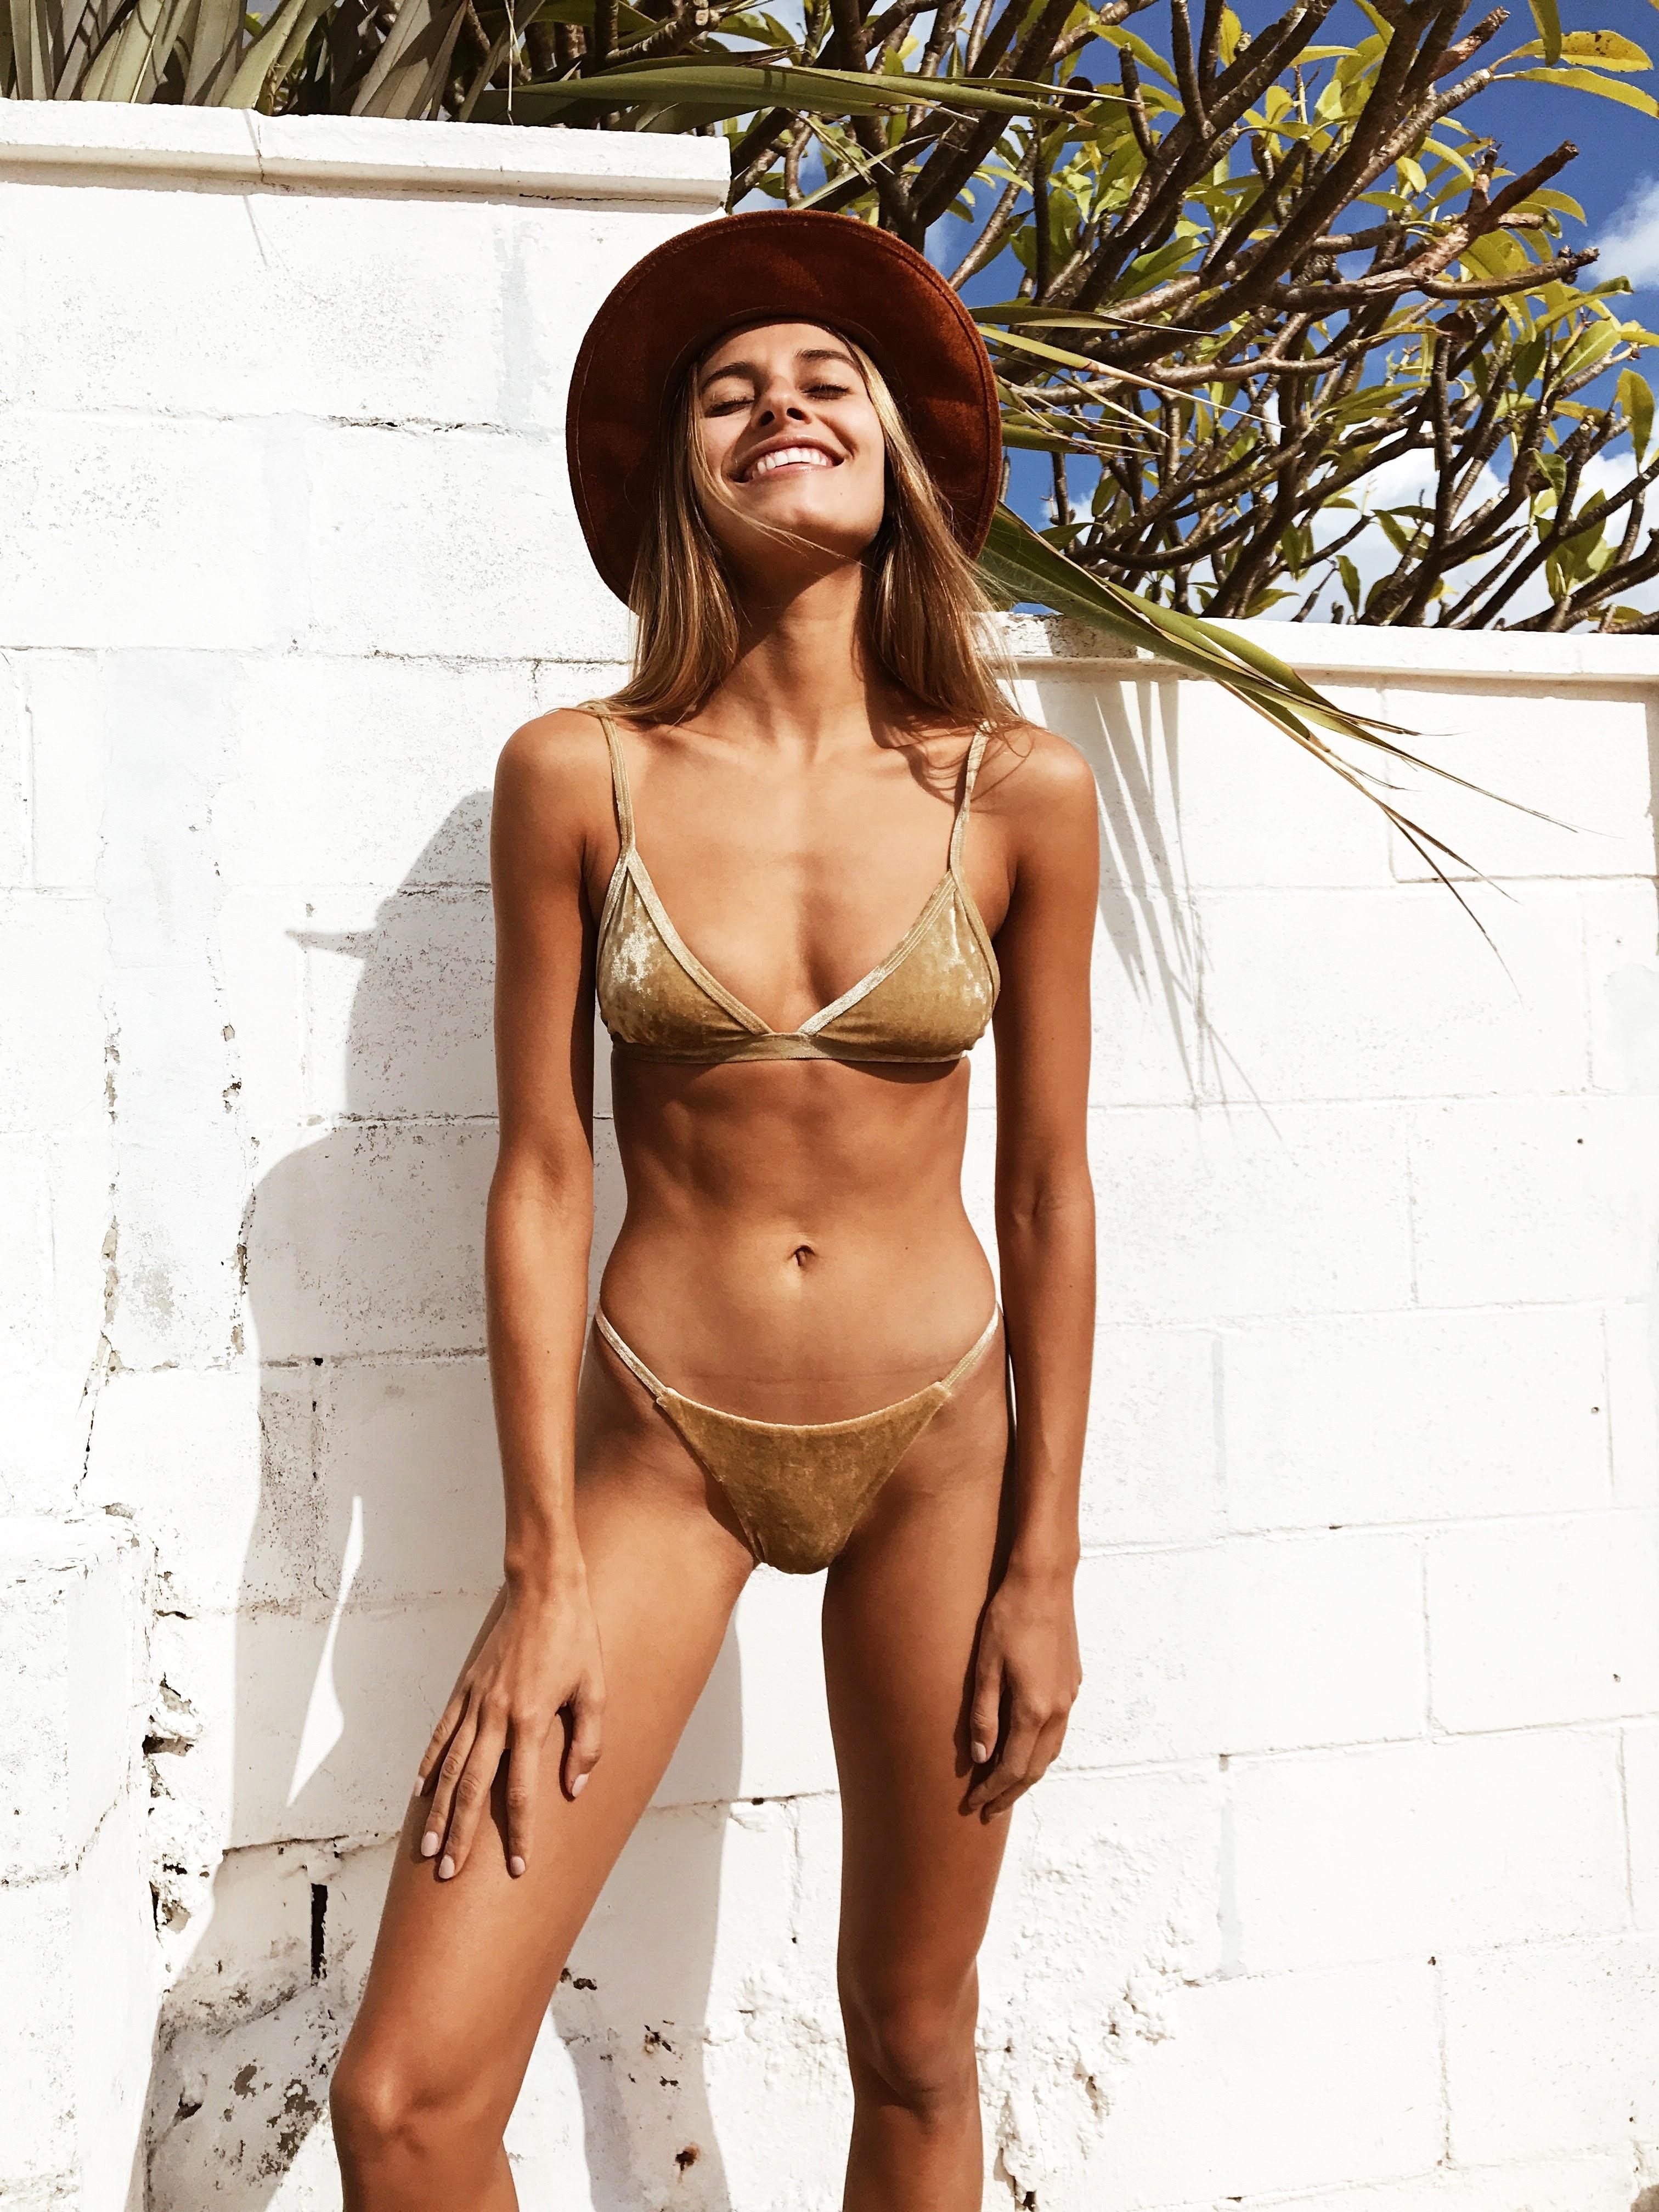 435e033e9b Pocket Girl 2018 Women Padded Bra Swimsuit Ladies Bikini Bandage Bikini Set  Swimwear Beachwear Micro Bikinis Femmes Maillot de-in Bikinis Set from  Sports ...